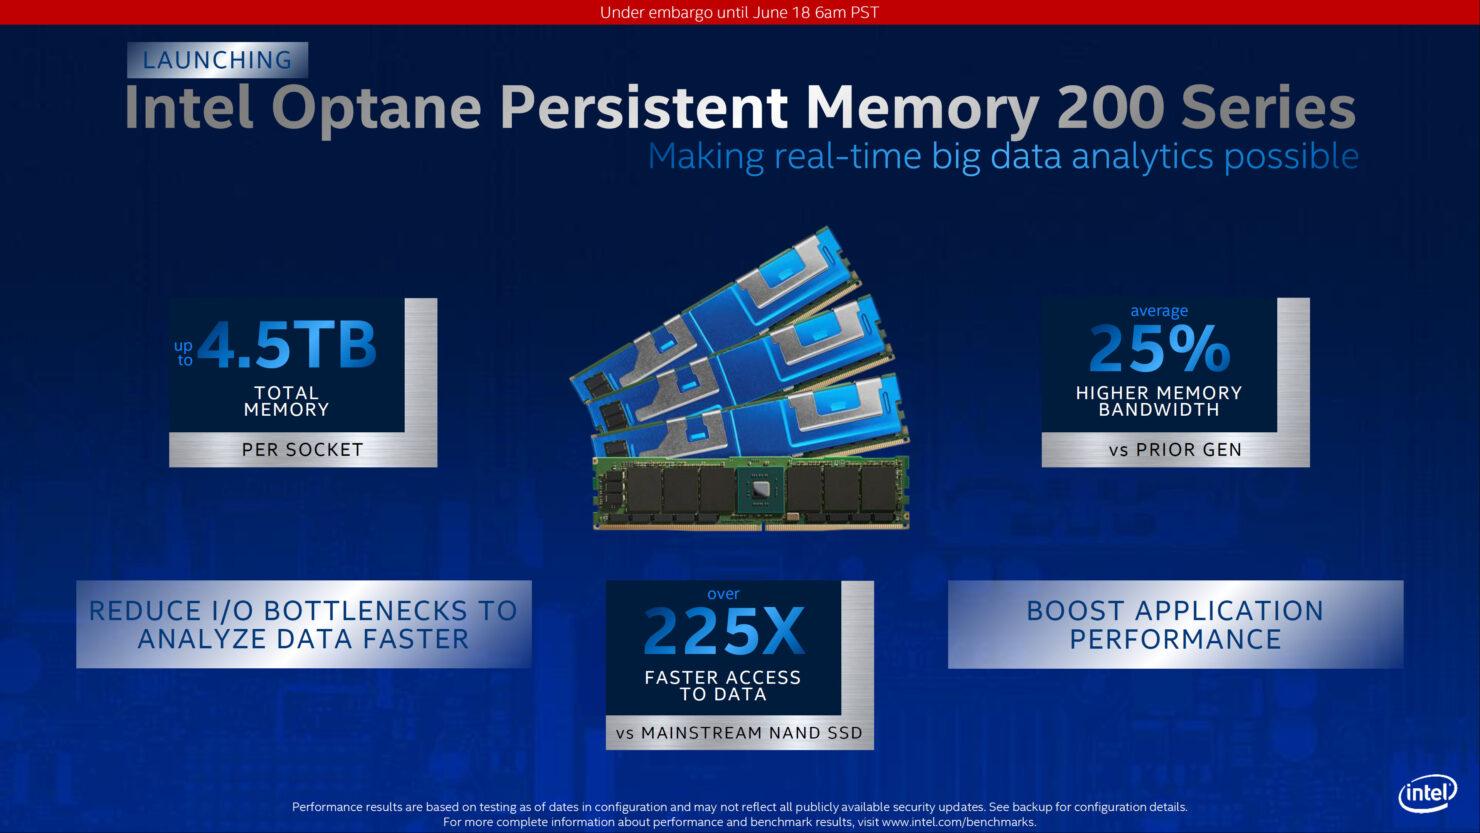 intel-3rd-gen-xeon-scalable-family_cooper-lake-sp_cedar-island-platform_dc-persisten-memory-optane-200_4